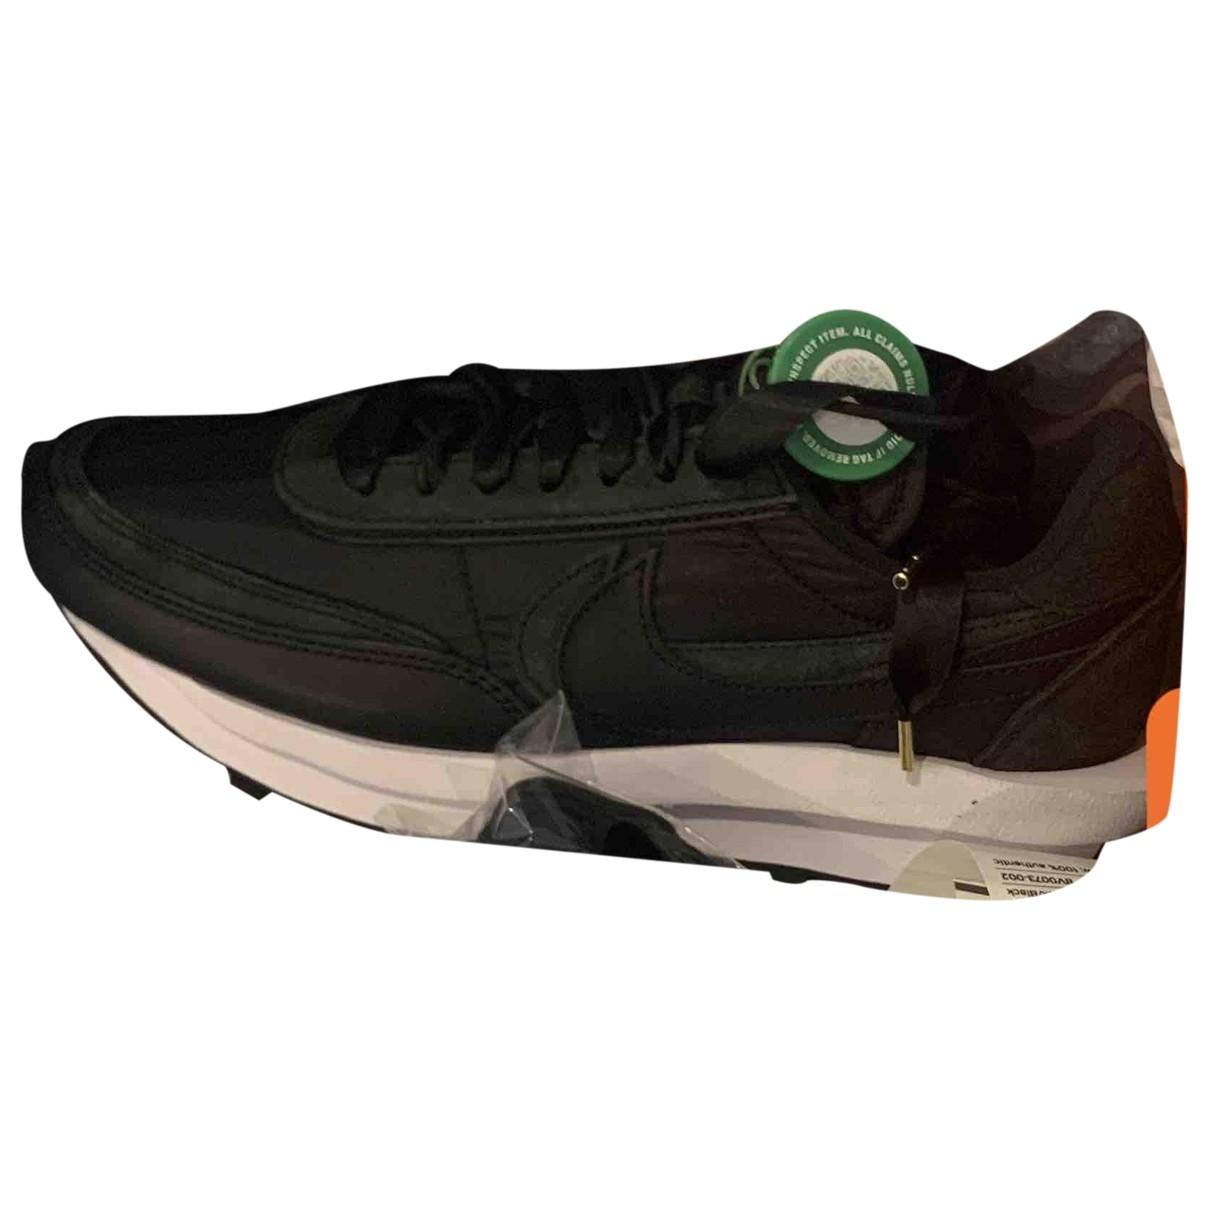 Nike X Sacai - Baskets LDV Waffle pour homme en toile - noir